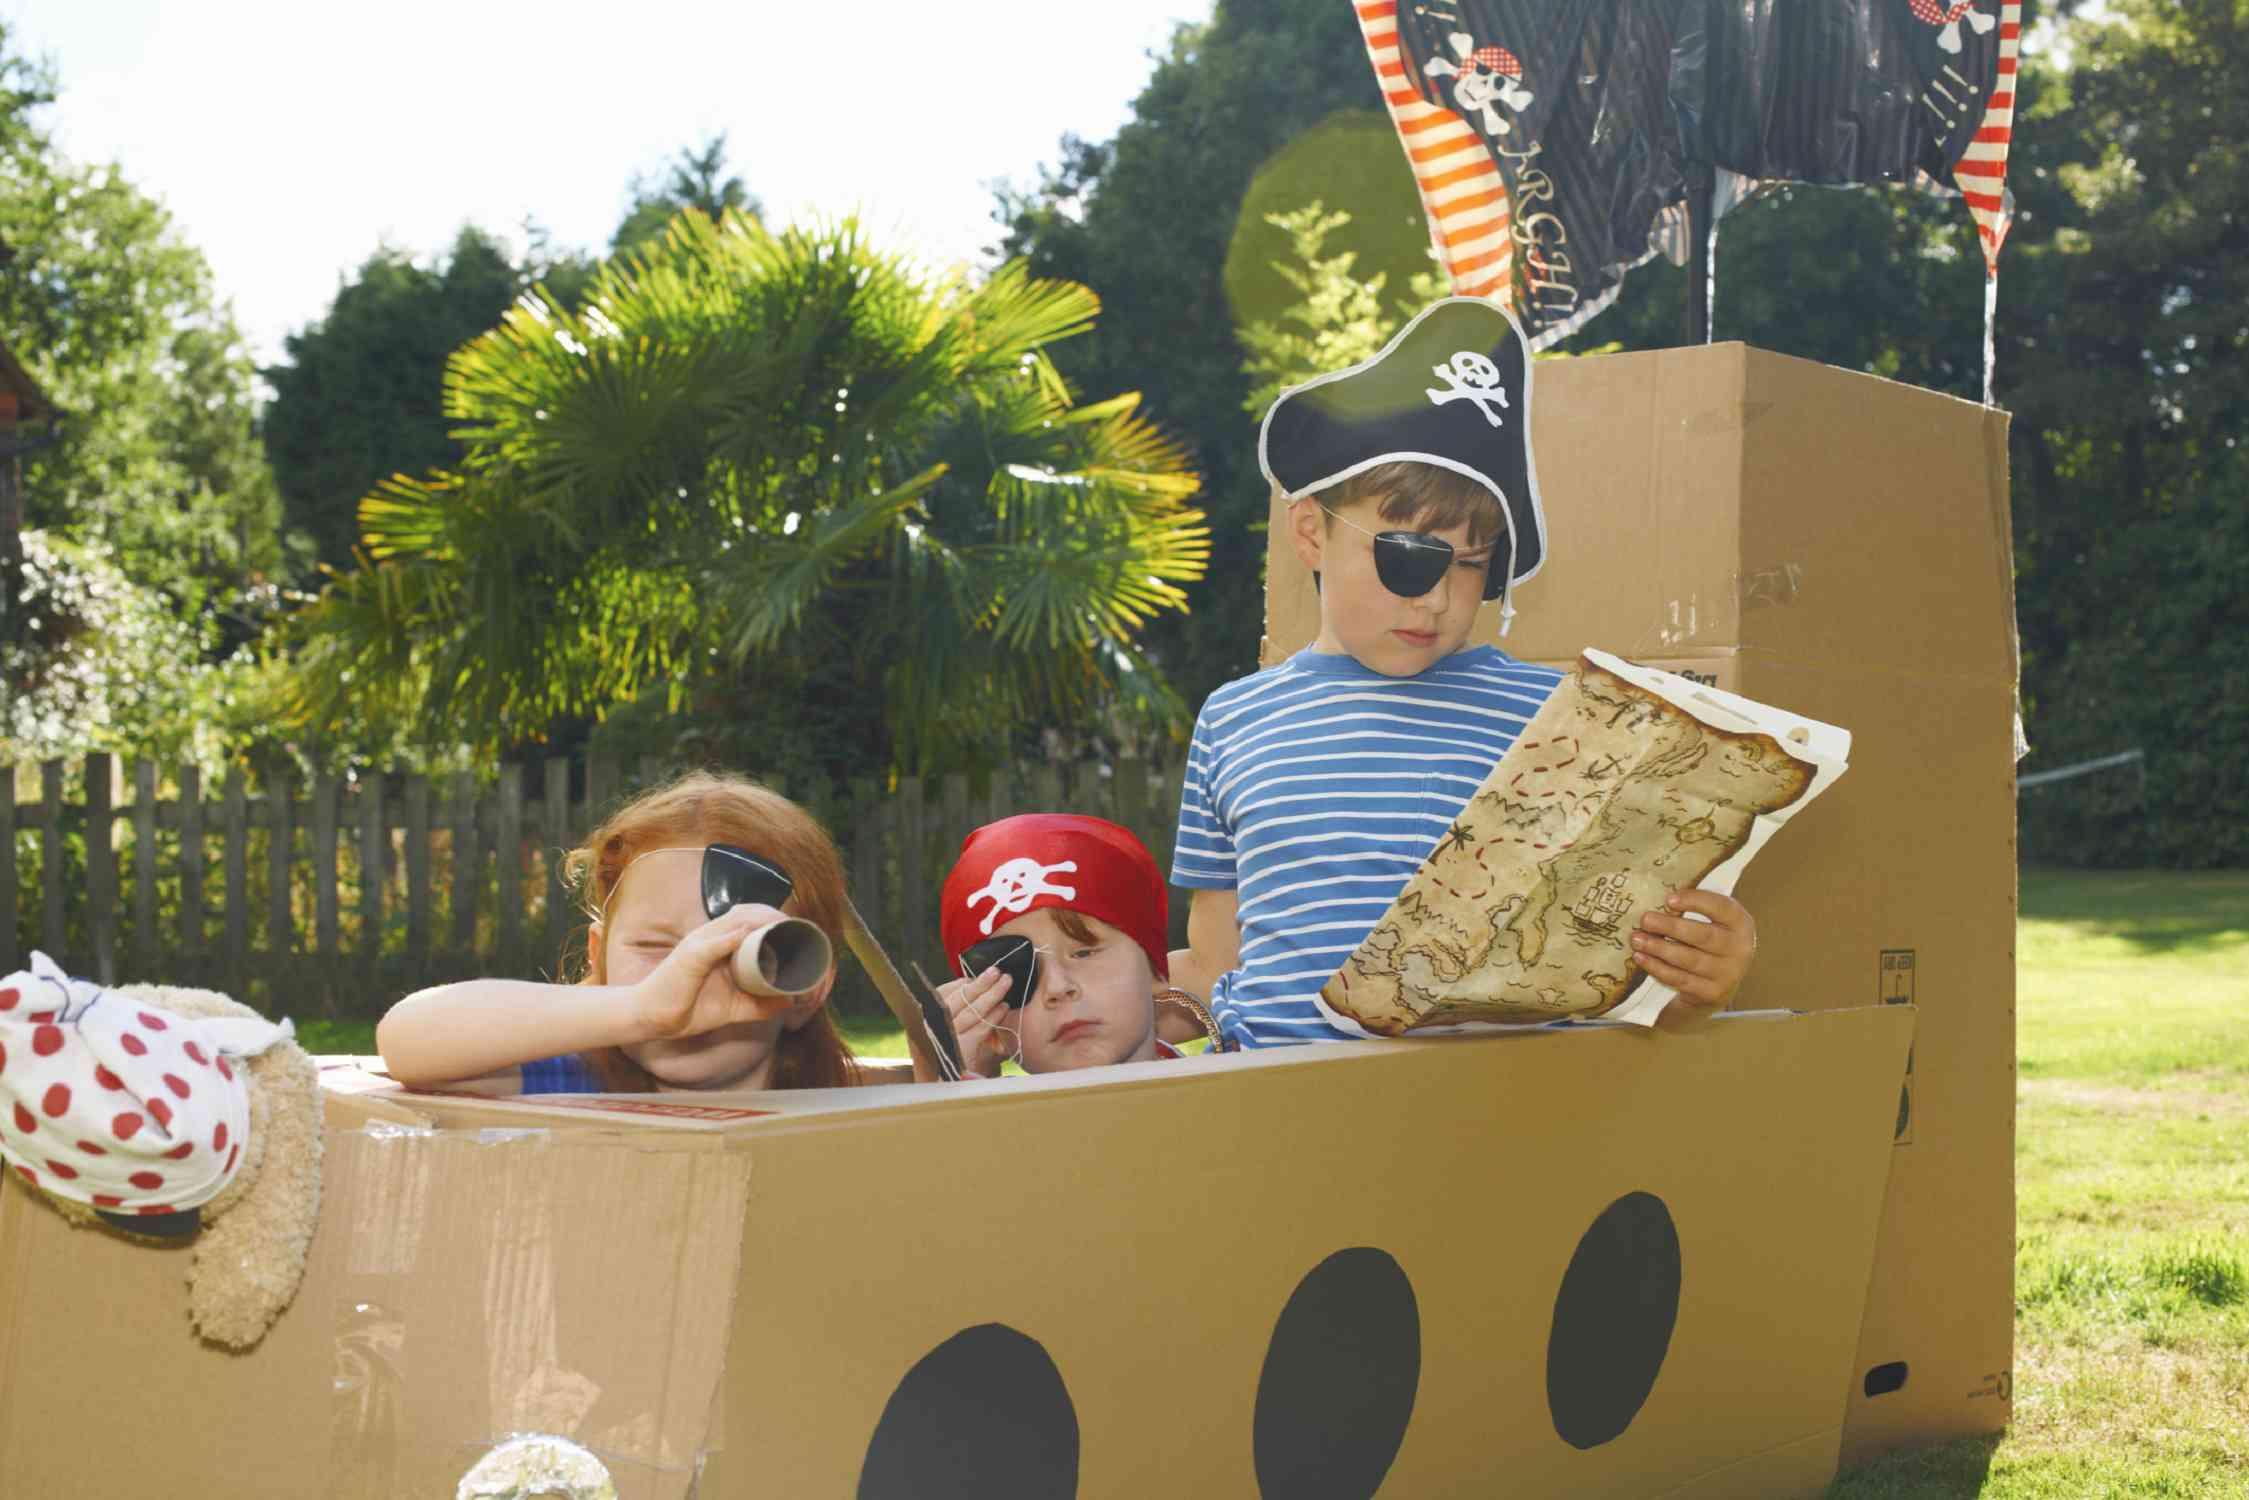 kids playing on a cardboard pirate ship